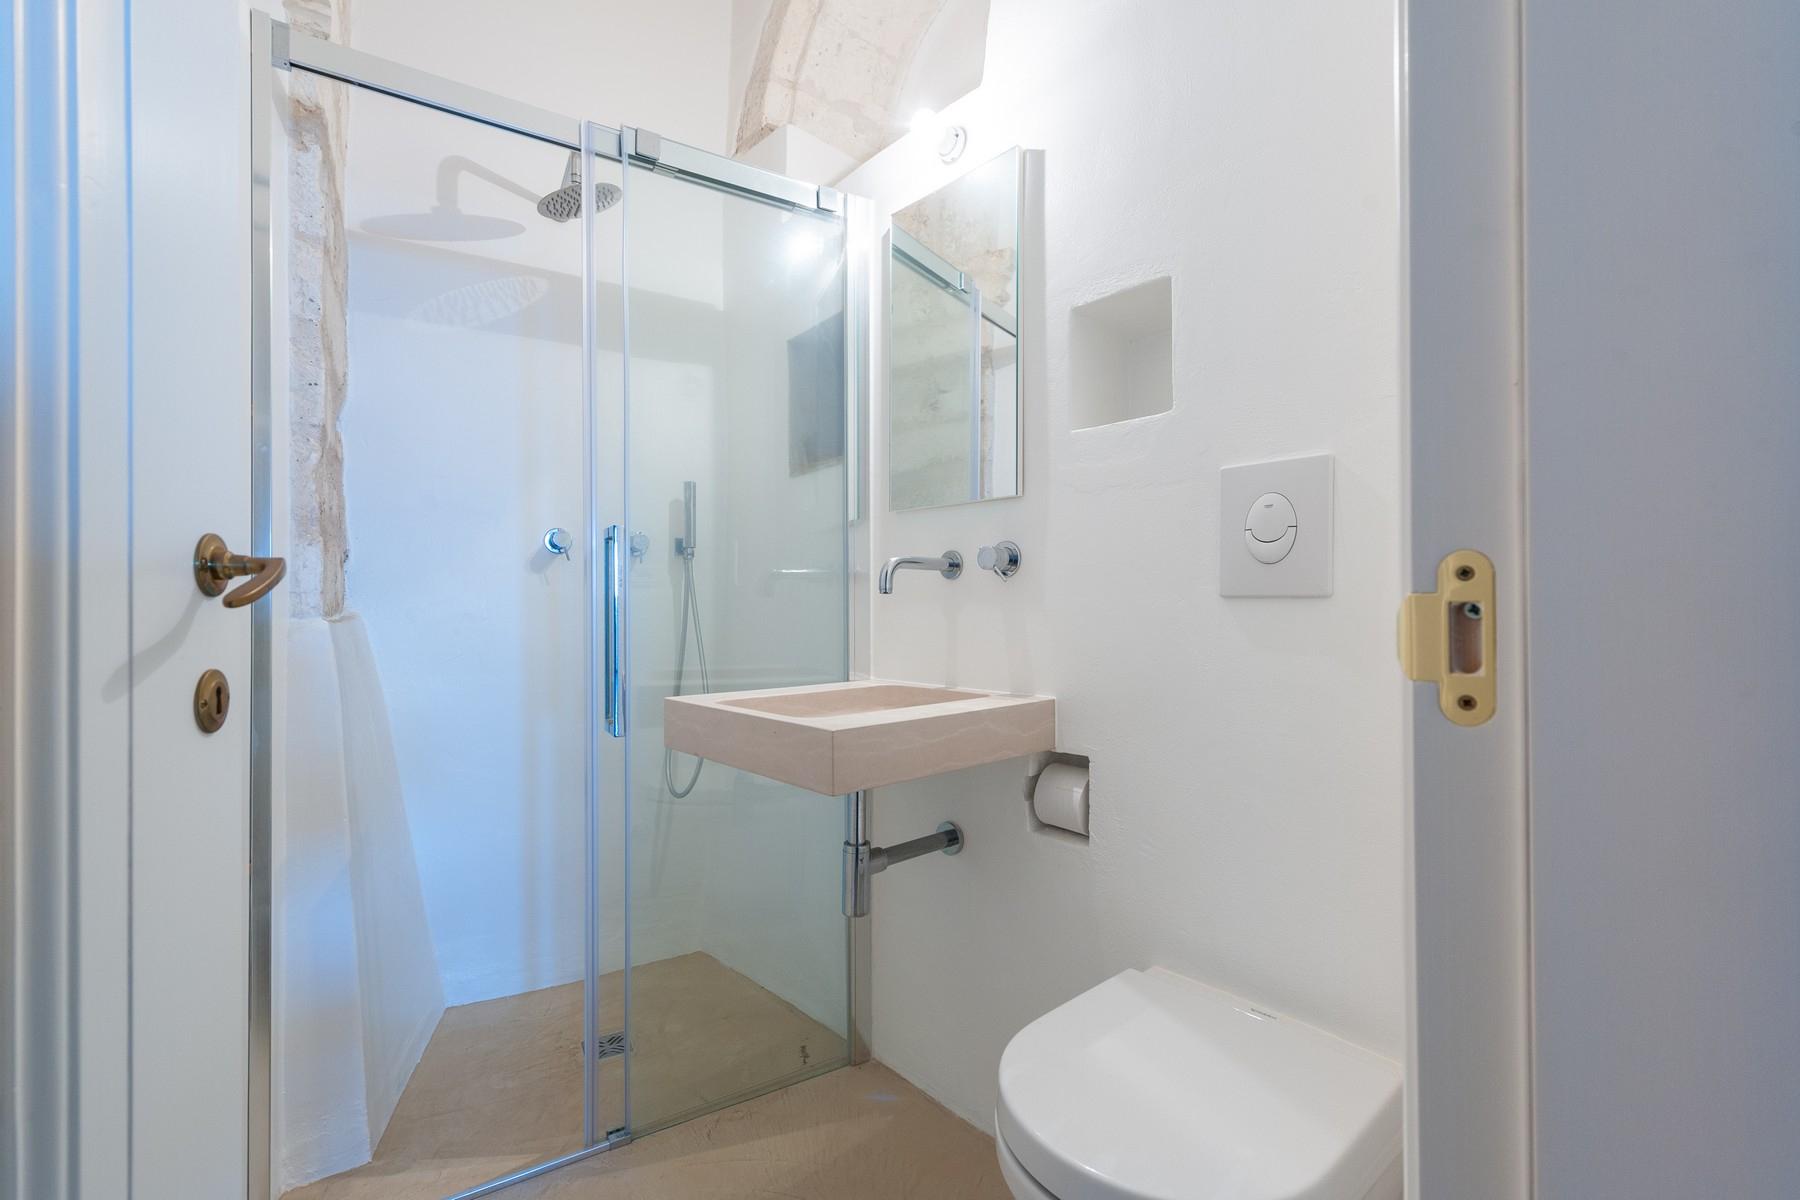 Appartamento in Vendita a Ostuni: 5 locali, 265 mq - Foto 26